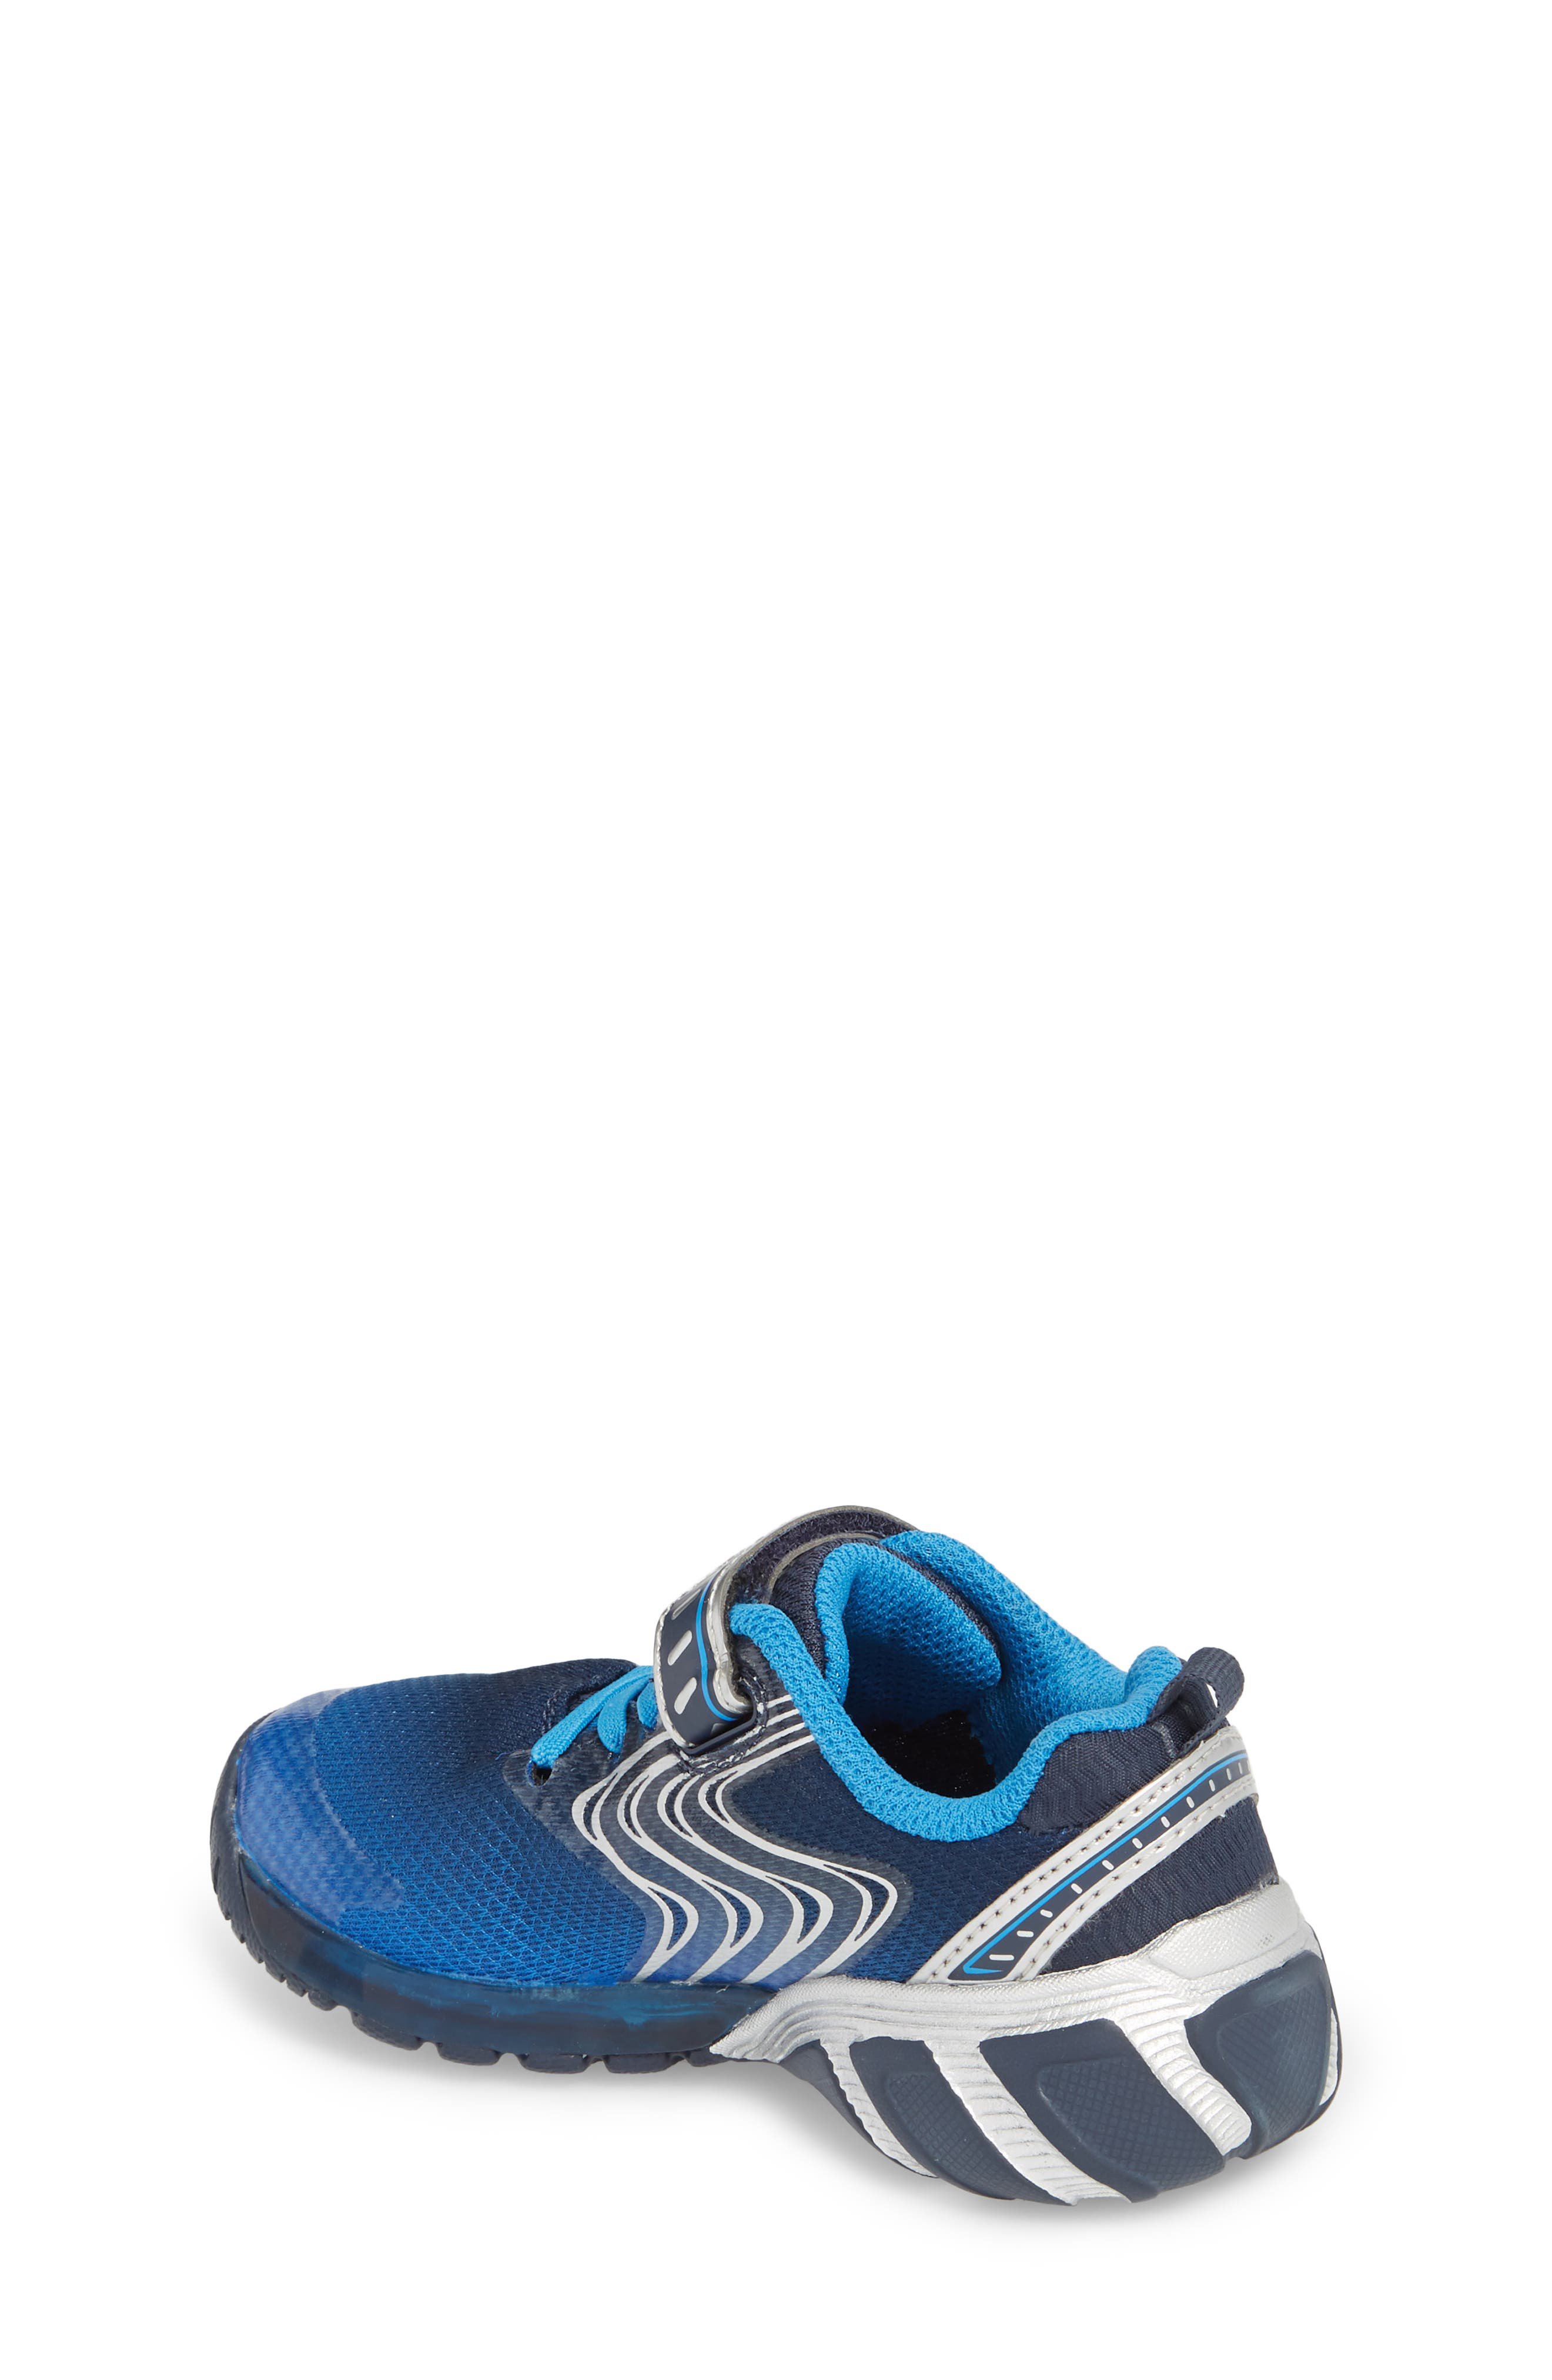 Alternate Image 2  - Stride Rite Lights Lux Light-Up Sneaker (Walker &Toddler)